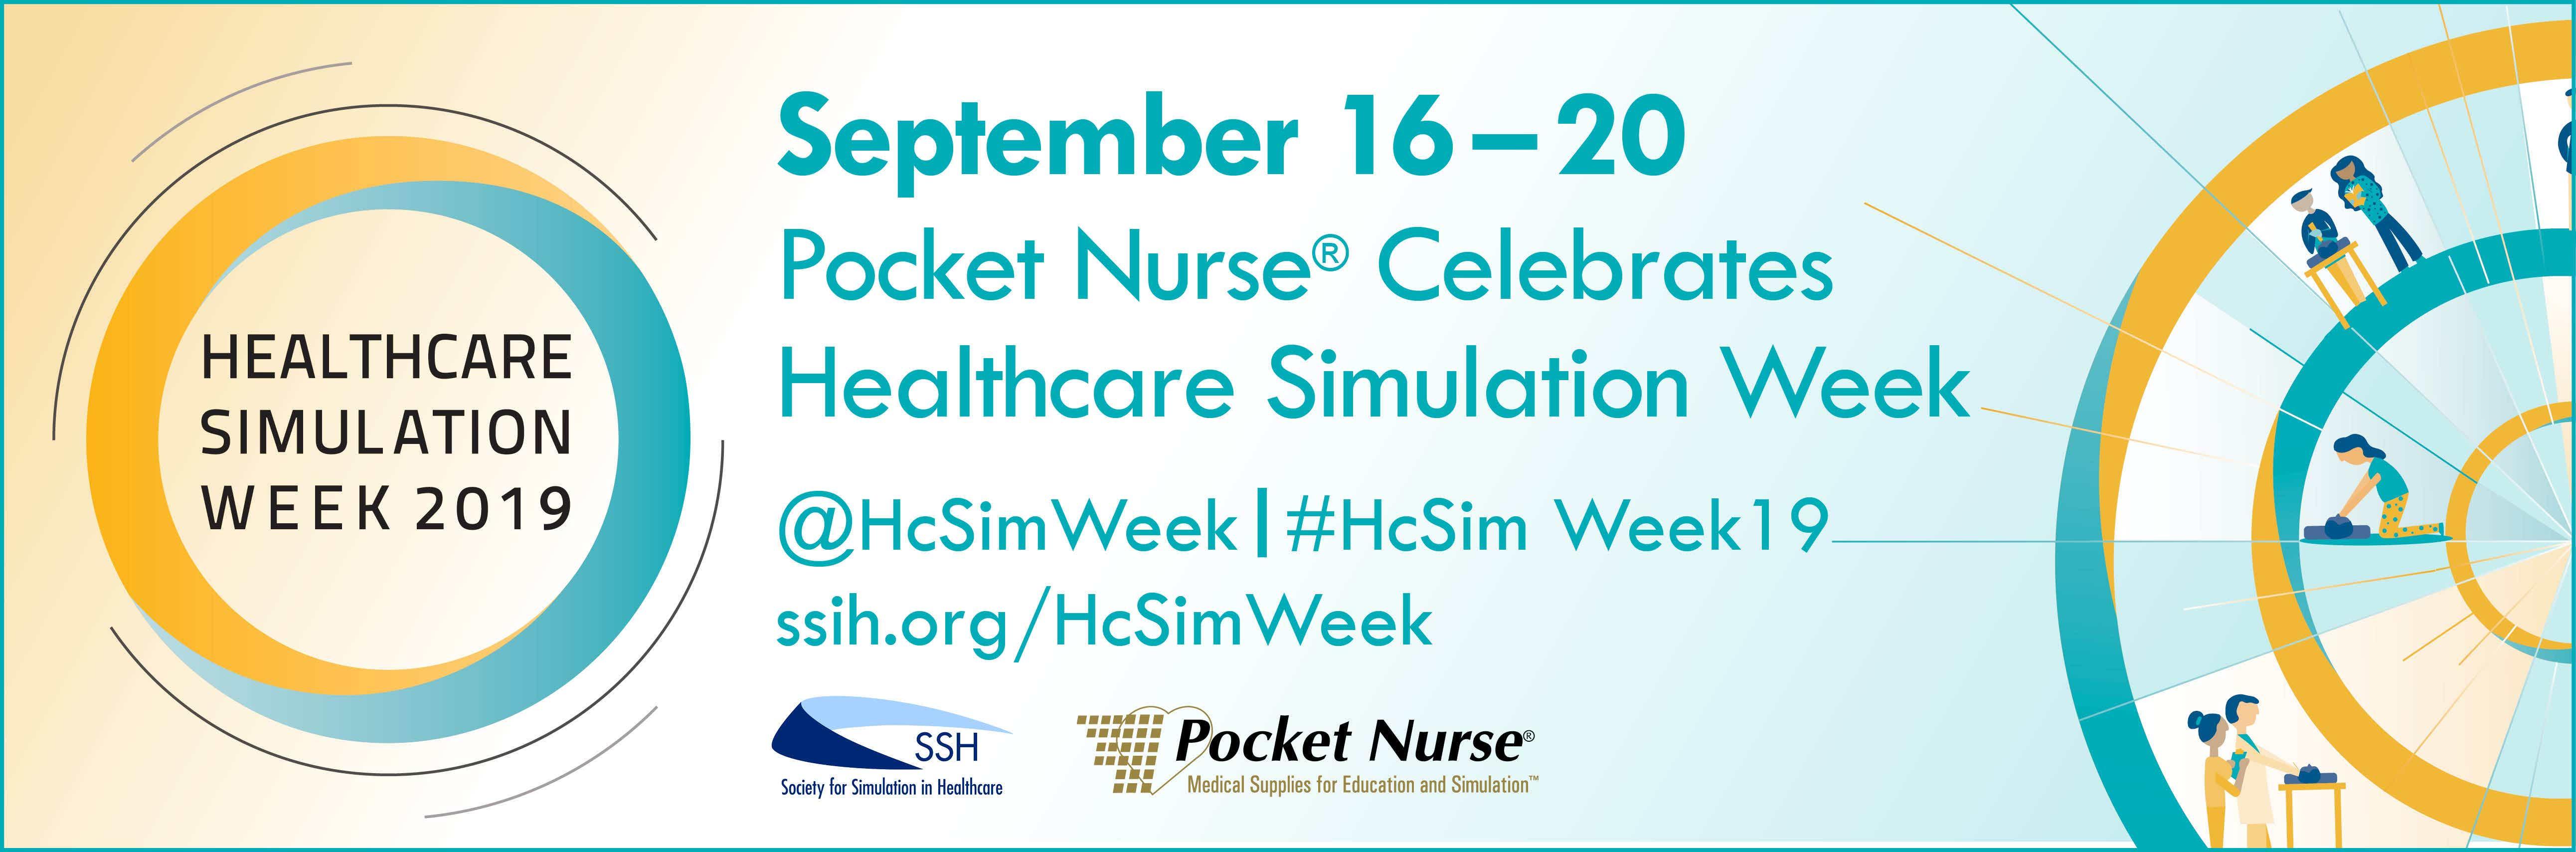 Healthcare Simulation Week